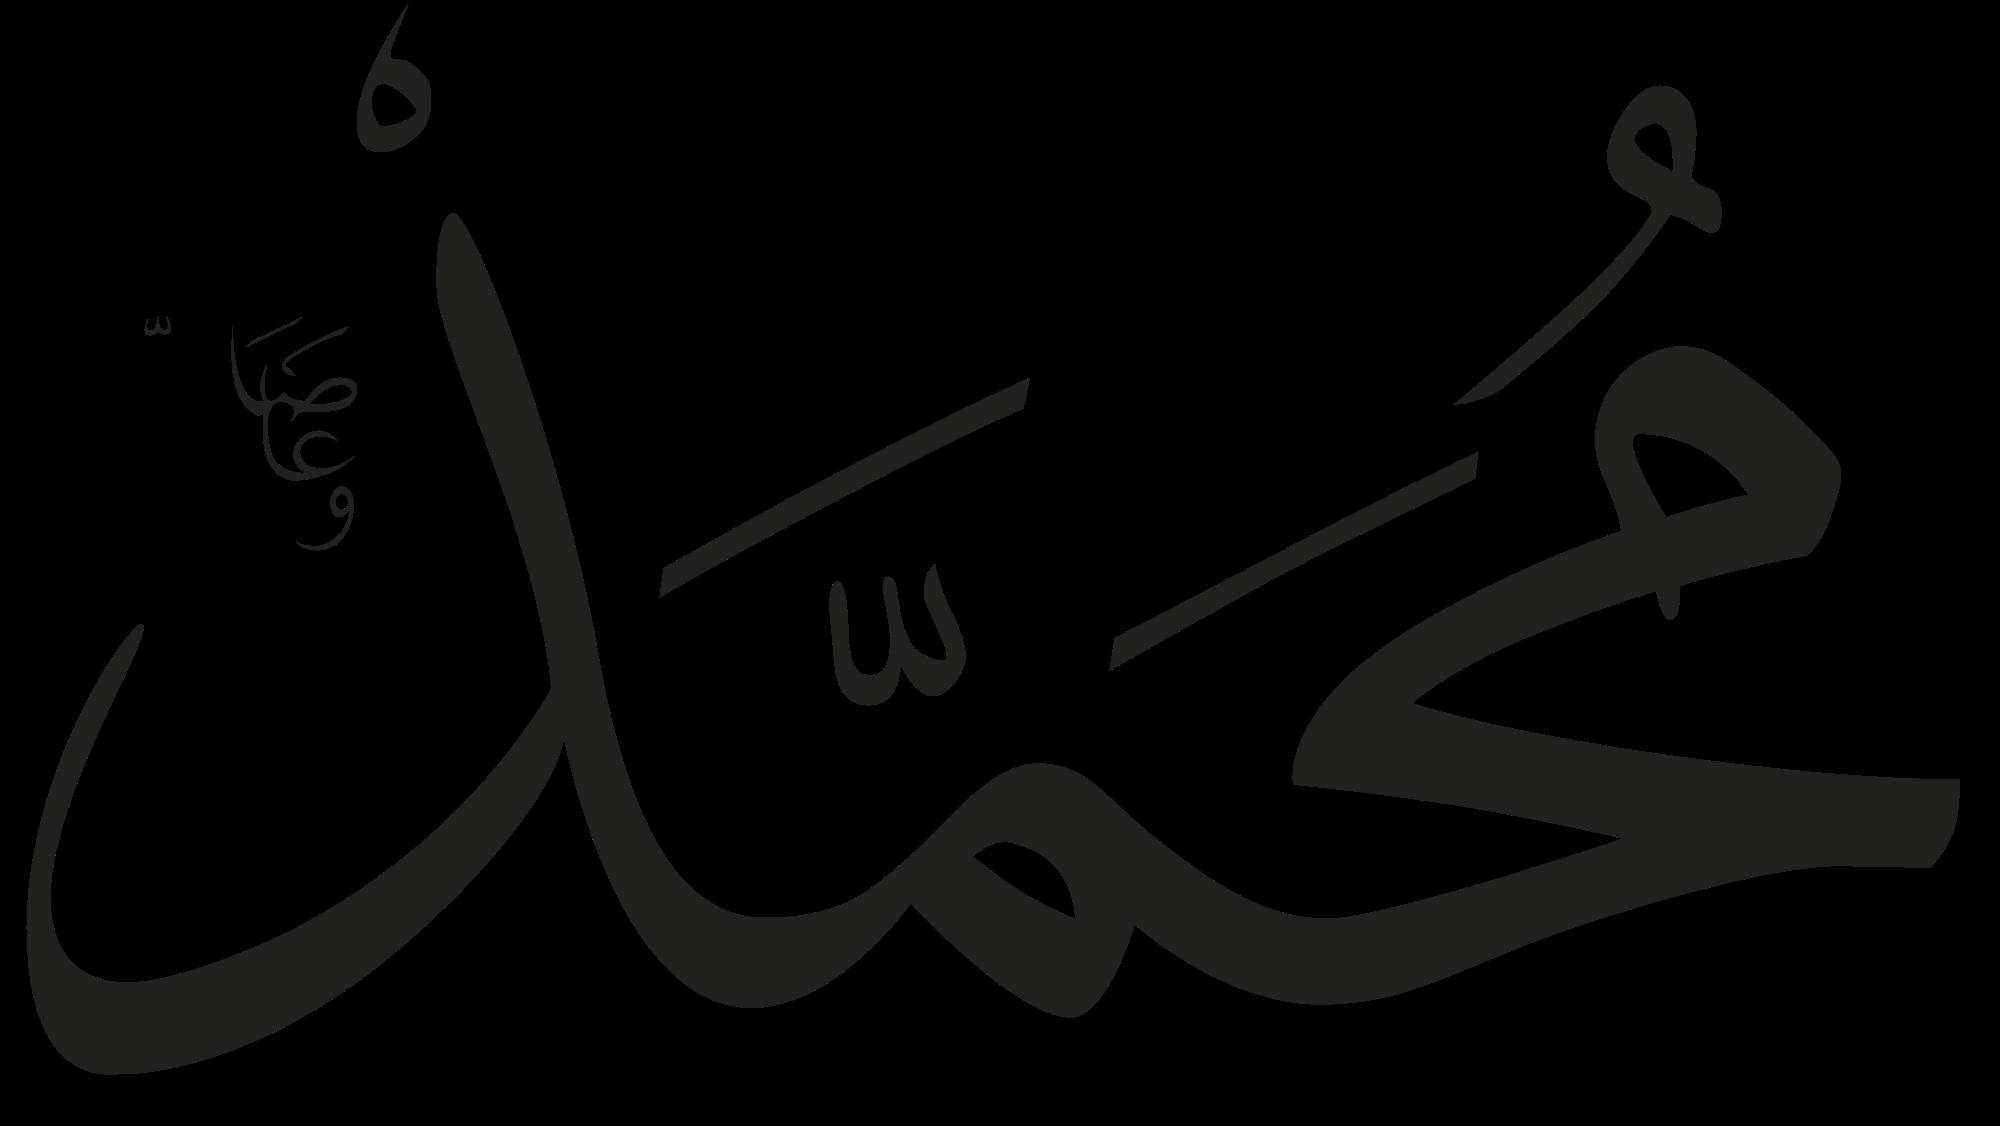 Muhammad PNG - 79720